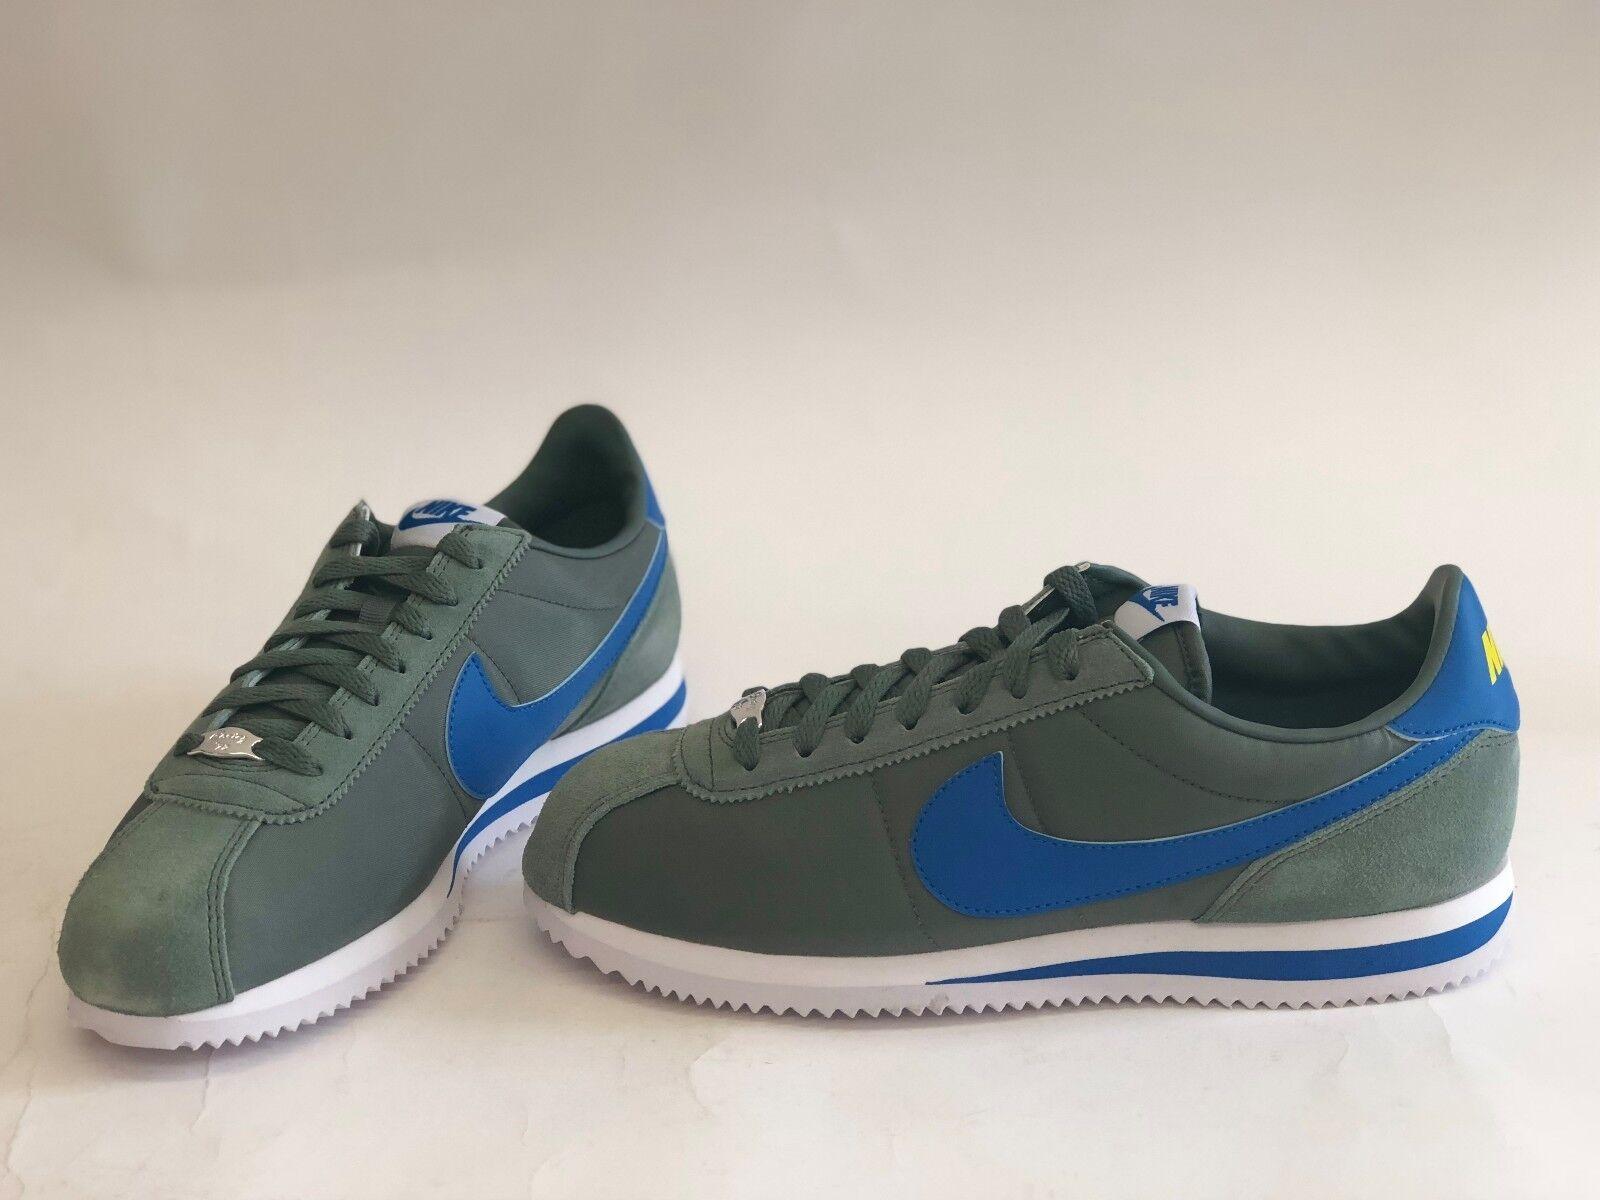 nib mens größe 819720-300 9 nike cortez sneakers - grüne 819720-300 größe grundlegende nylon. 6359eb